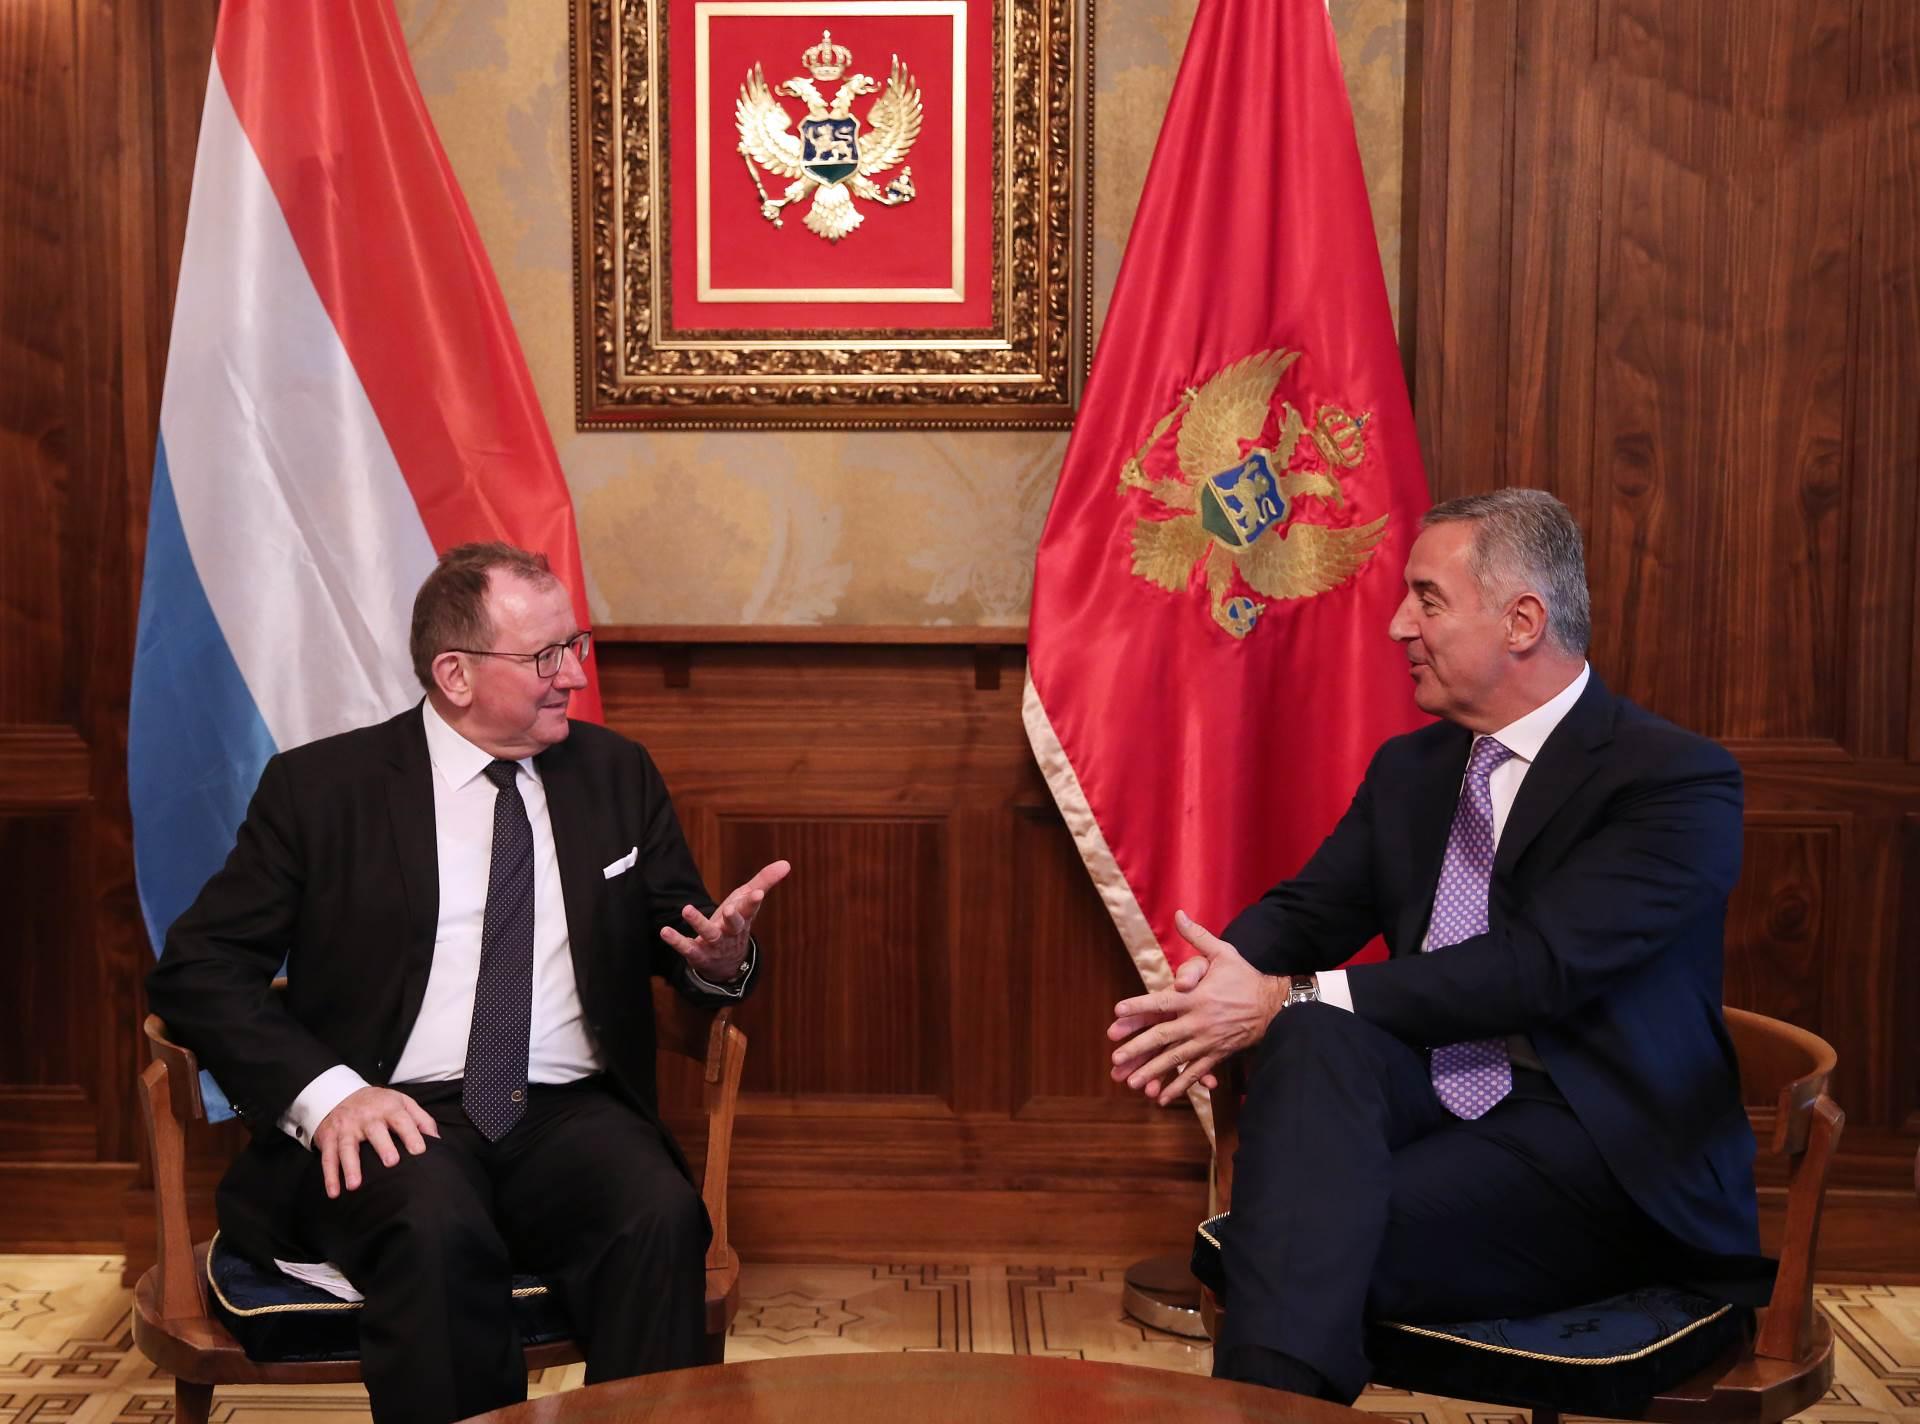 Đukanović primio šefa parlamenta Luksemburga